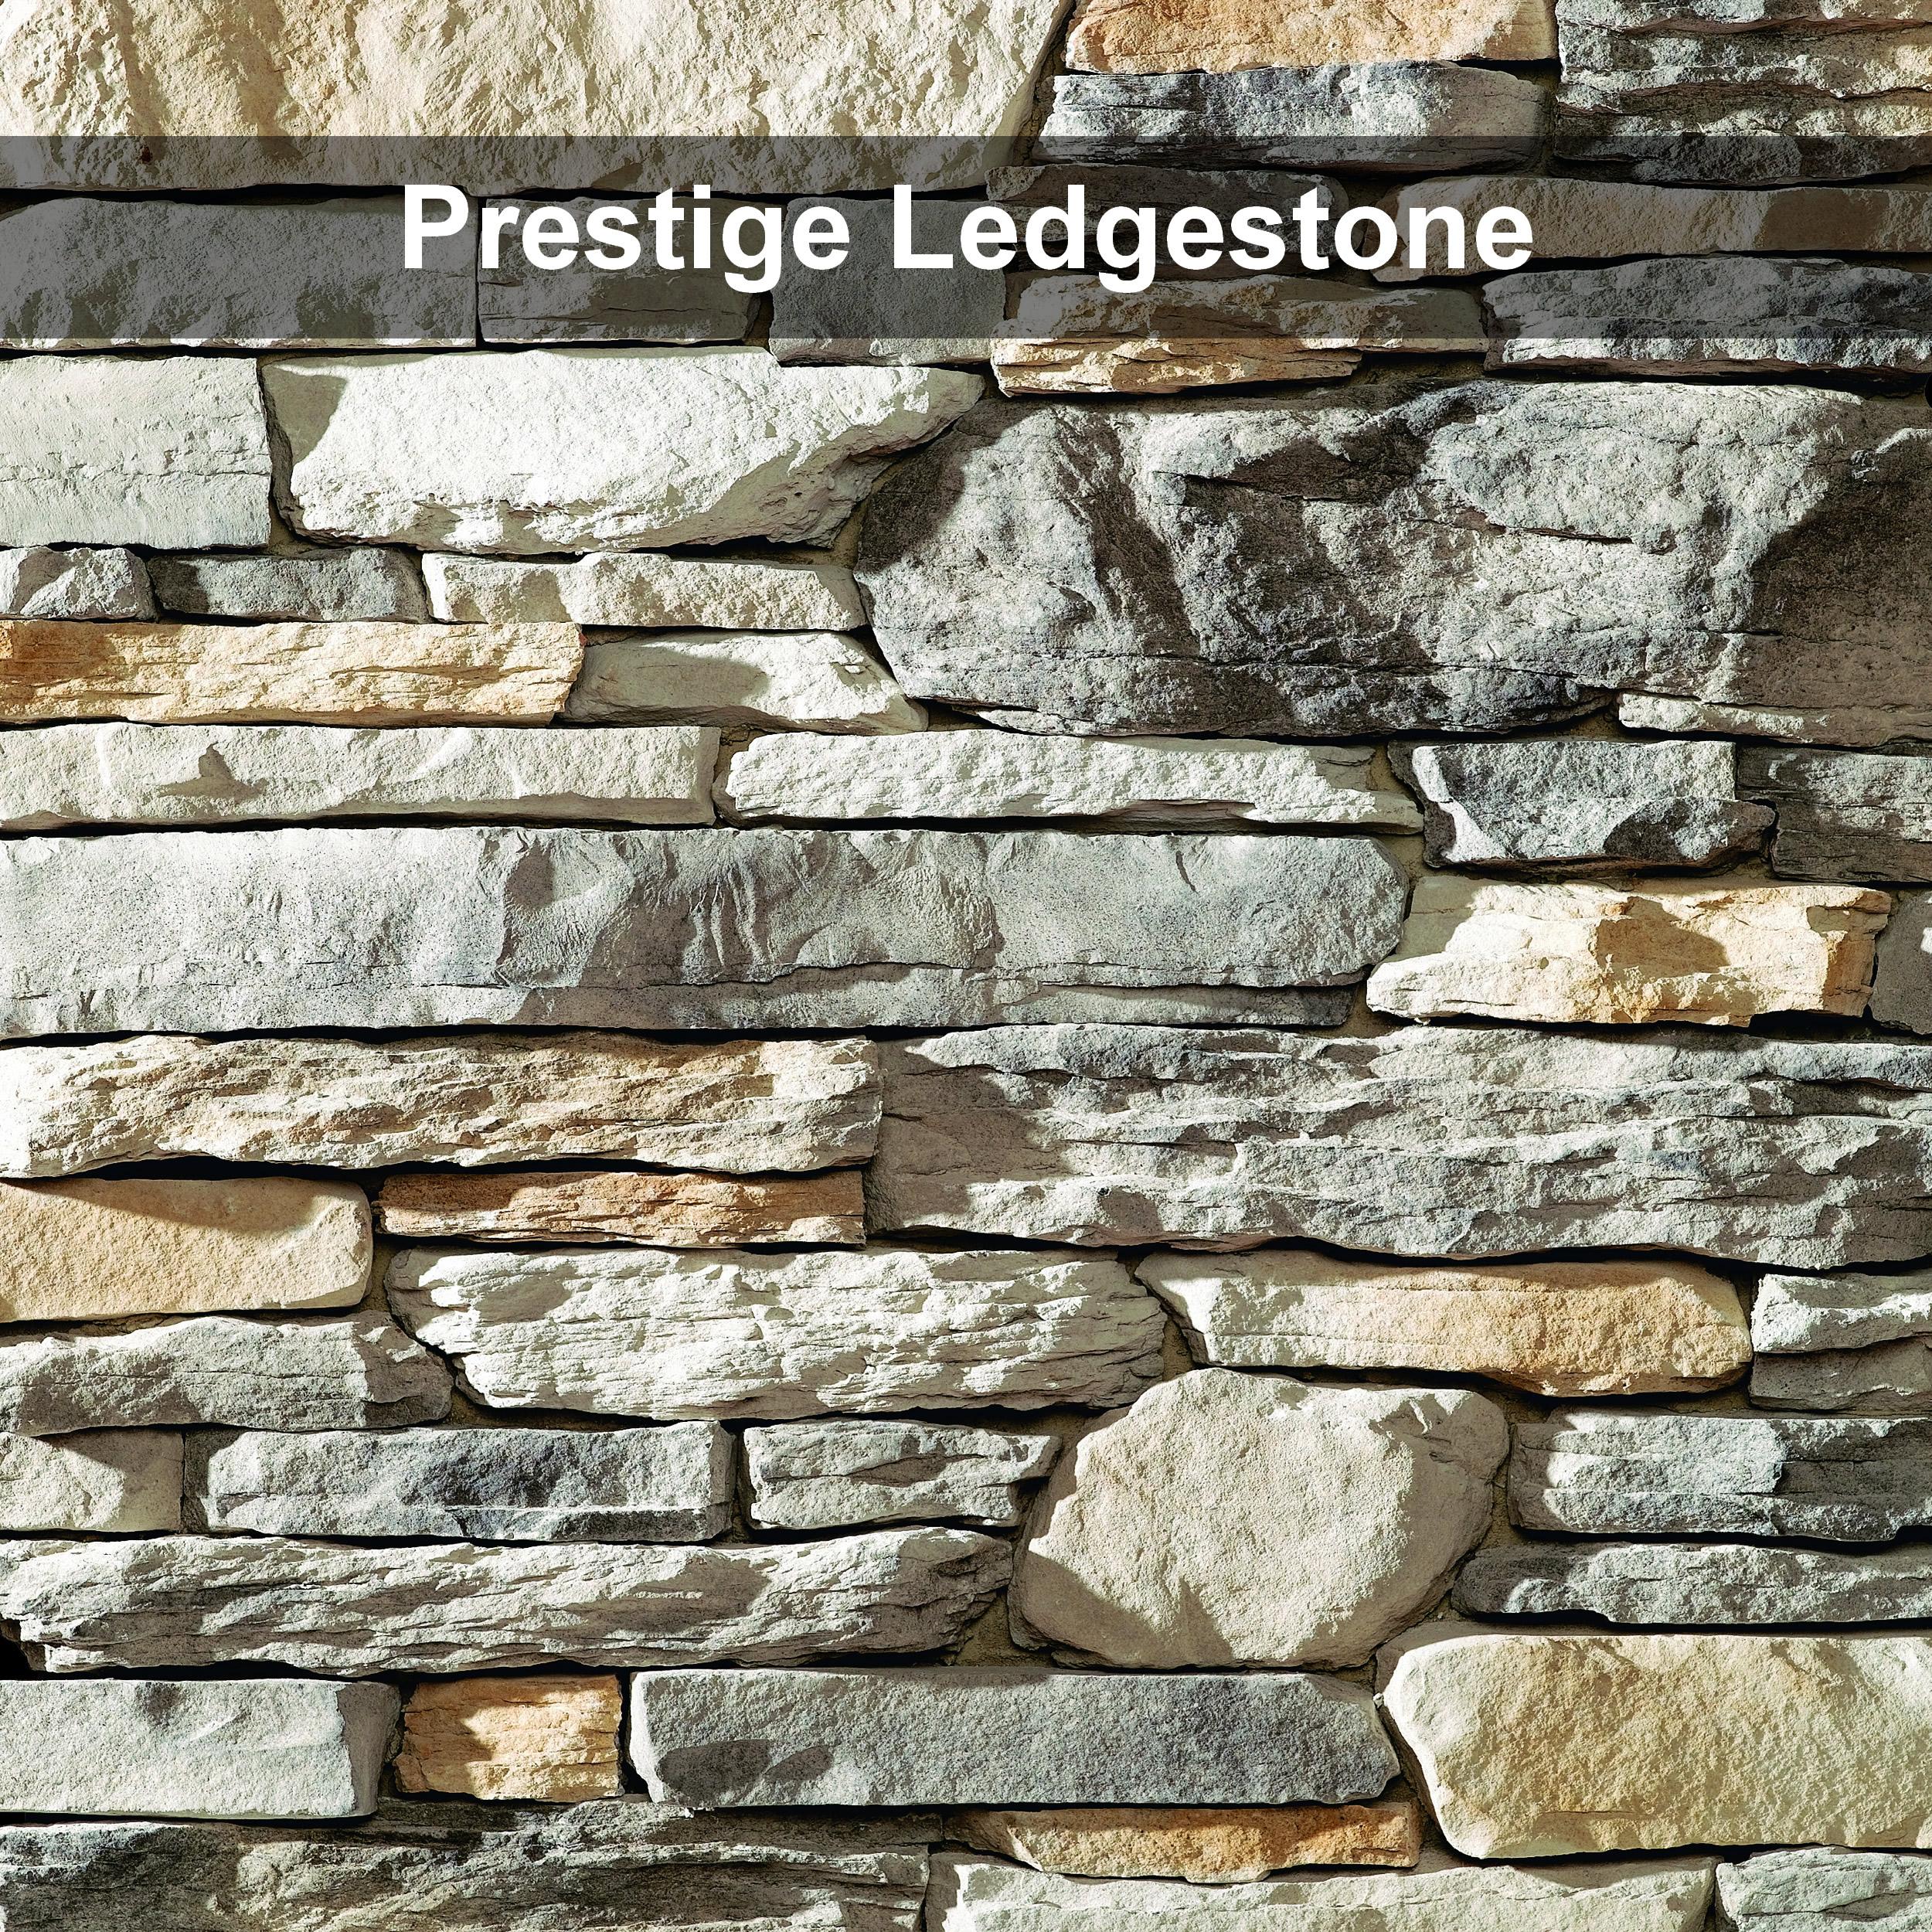 DQ_Ledgestone_Prestige_Profile.jpg